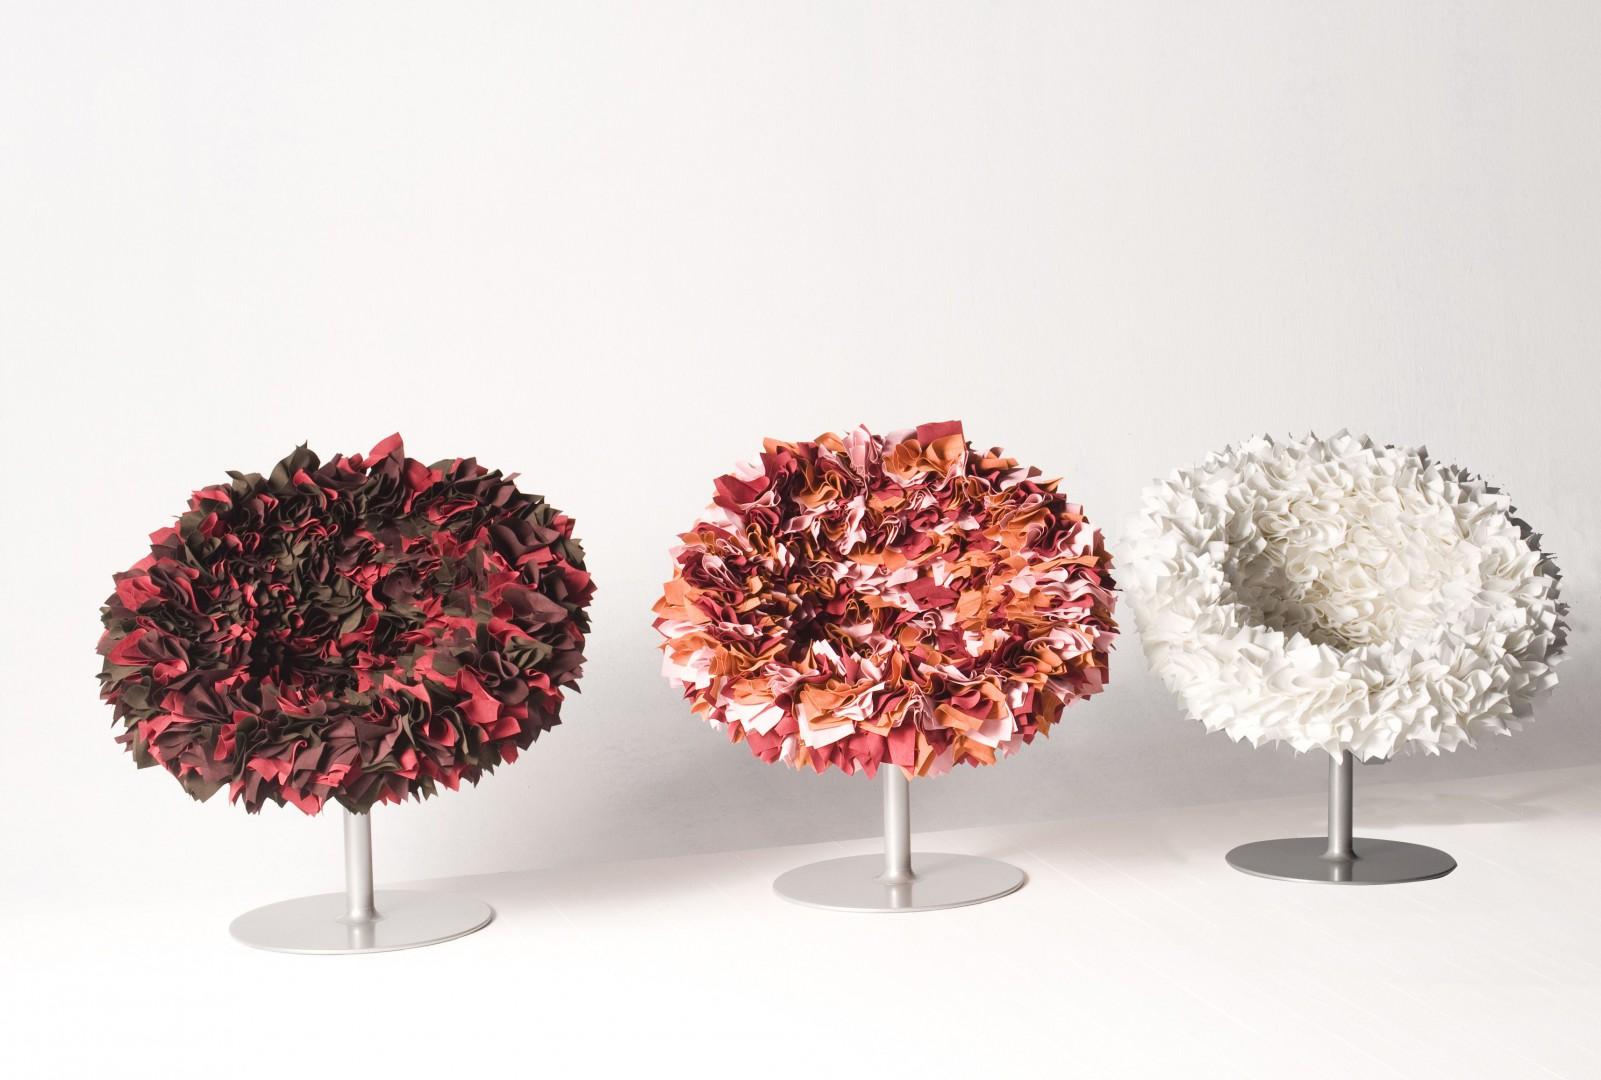 Fotele z kolekcji Bouquet firmy Moroso. Projekt: Tokujin Yoshioka. Fot. Moroso